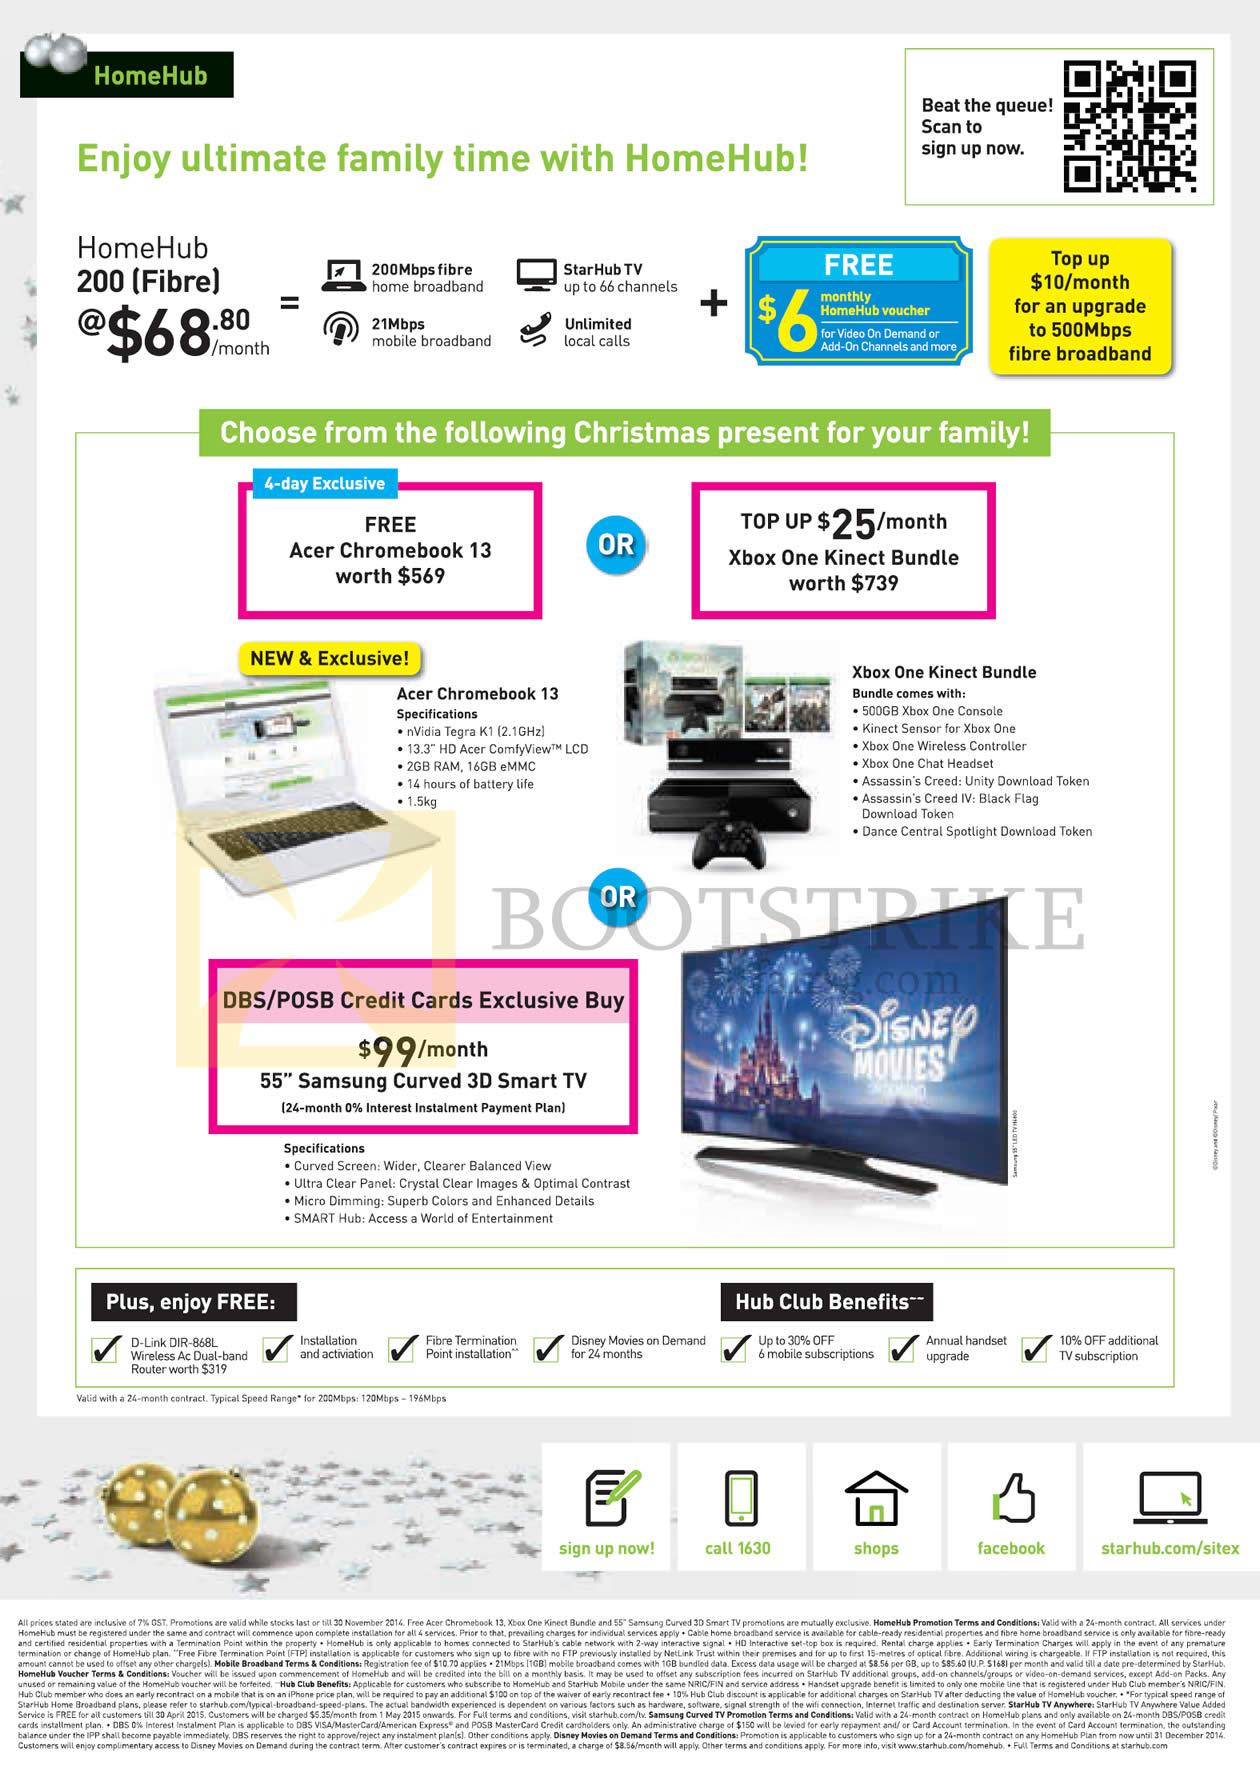 Starhub HomeHub 200 Fibre 68 80 Acer Chromebook 13 Xbox e